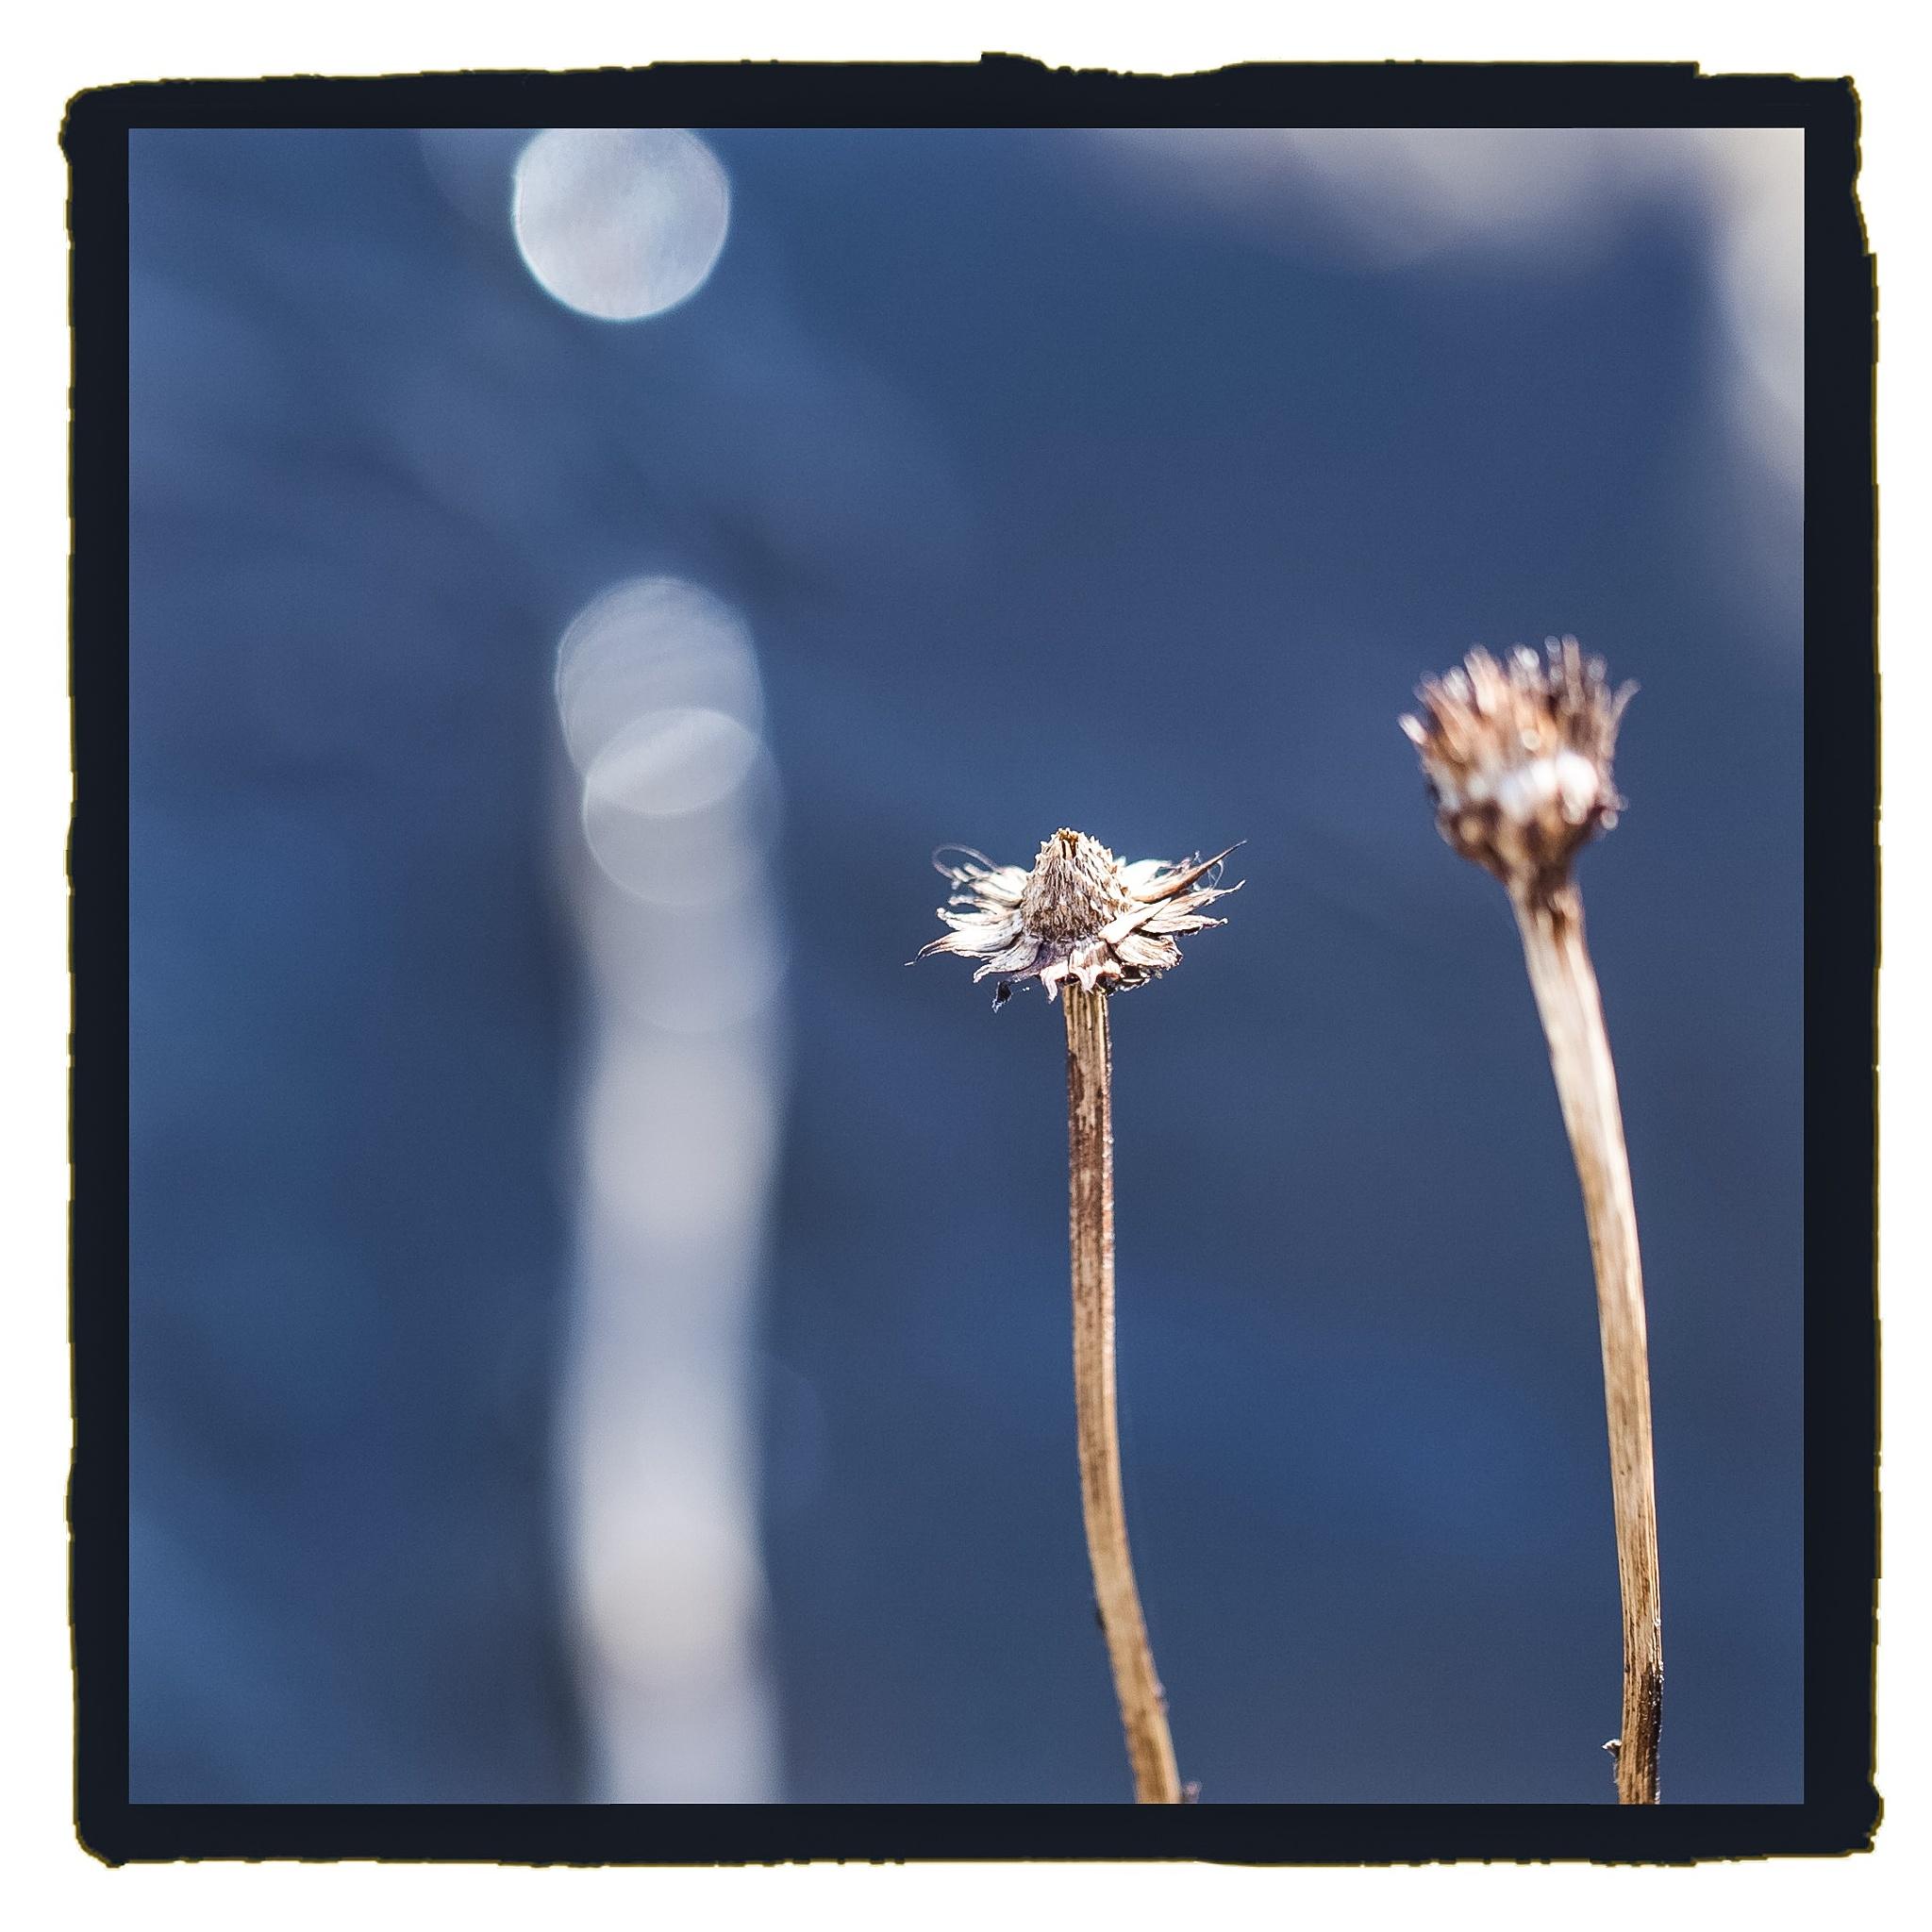 Untitled by miedeschepper